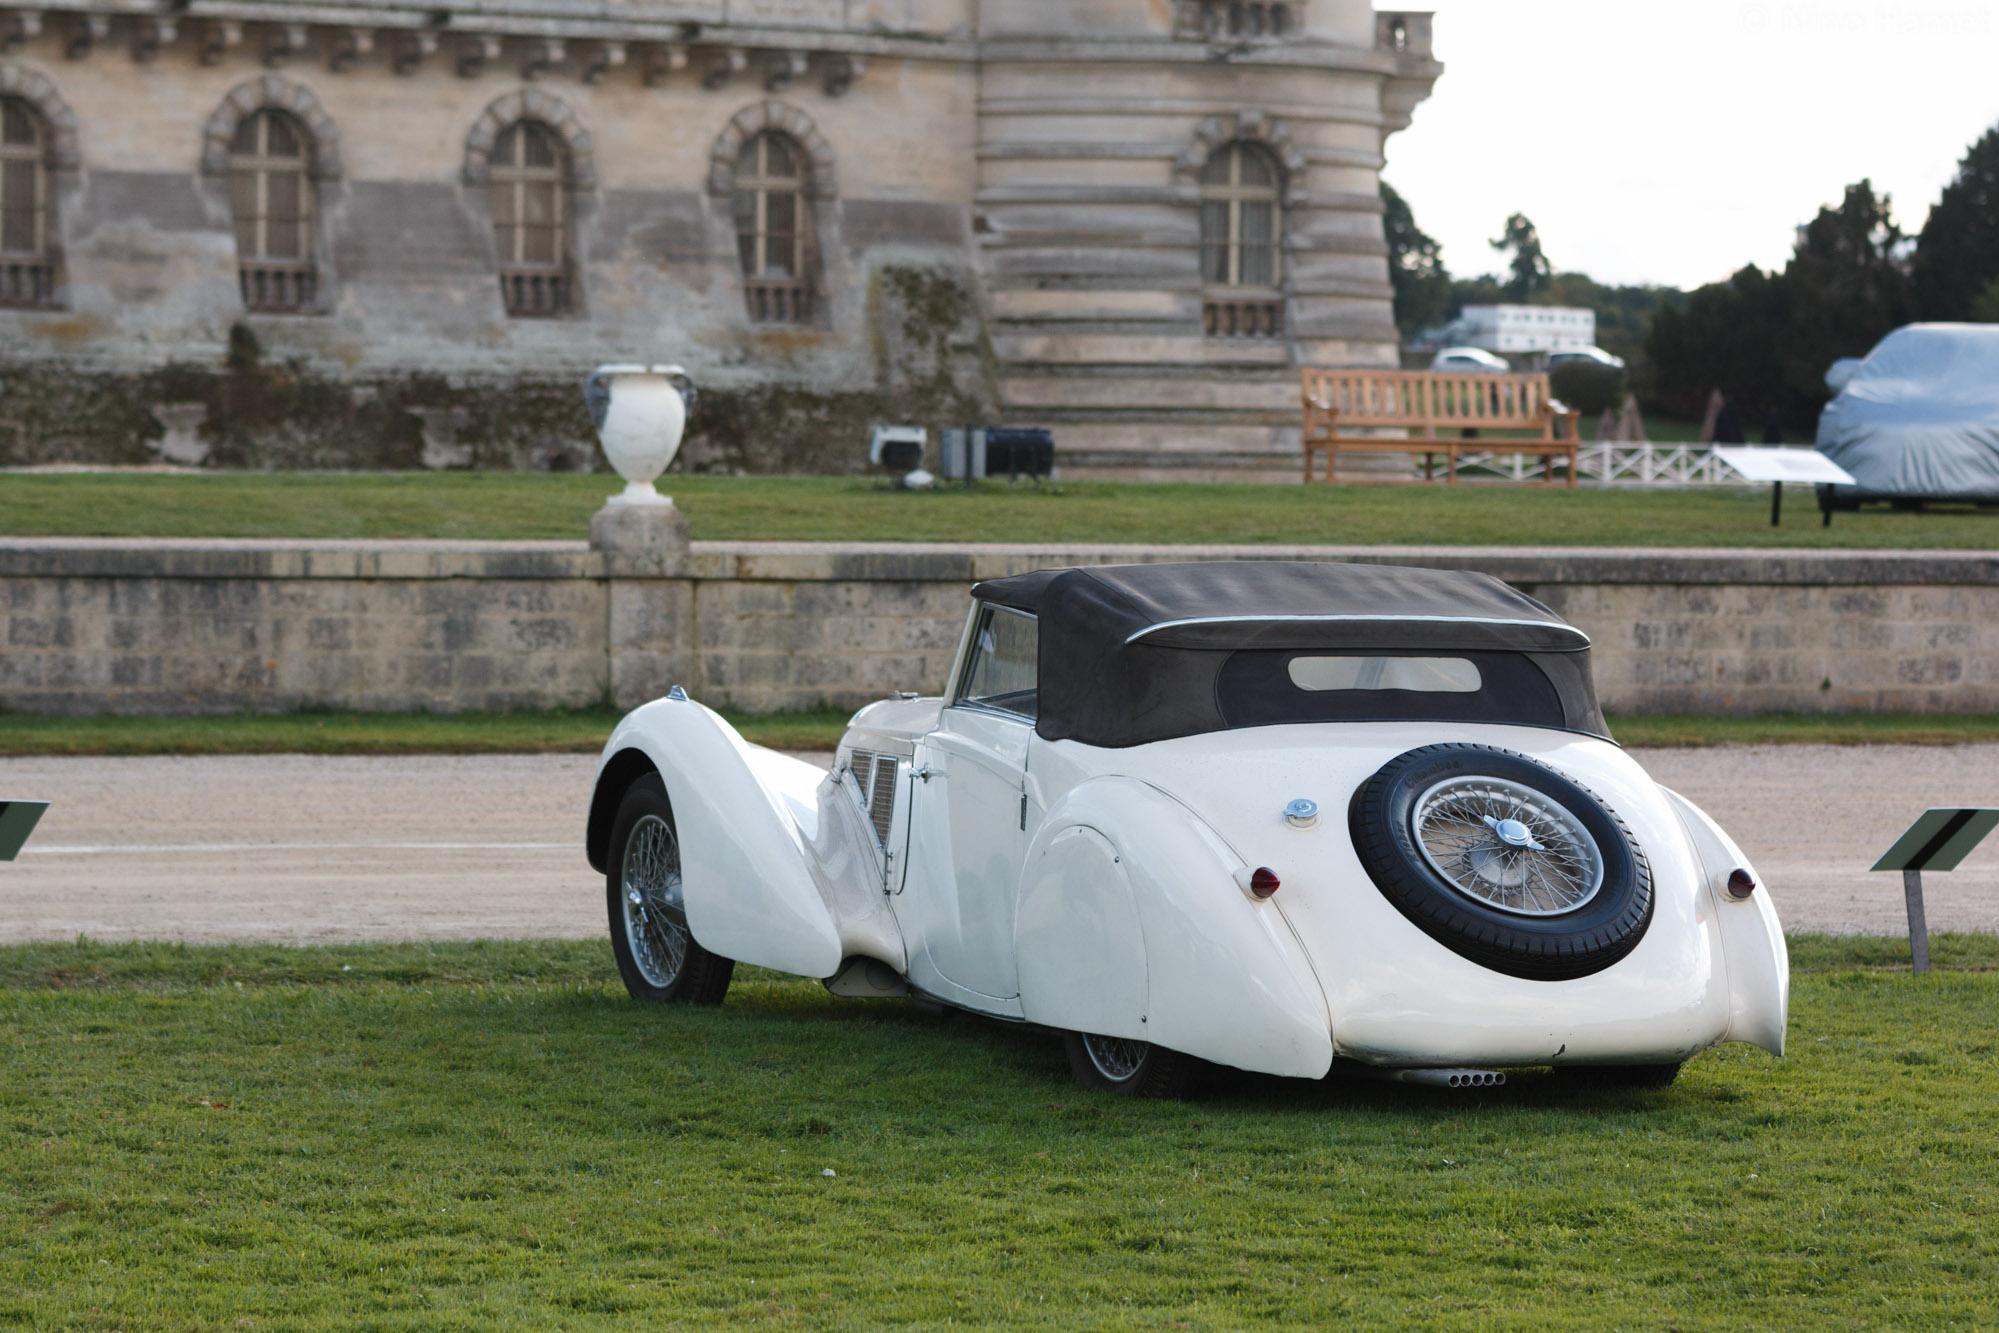 Bugatti Type 57 S Cabriolet Van Vooren #57571 – 1938